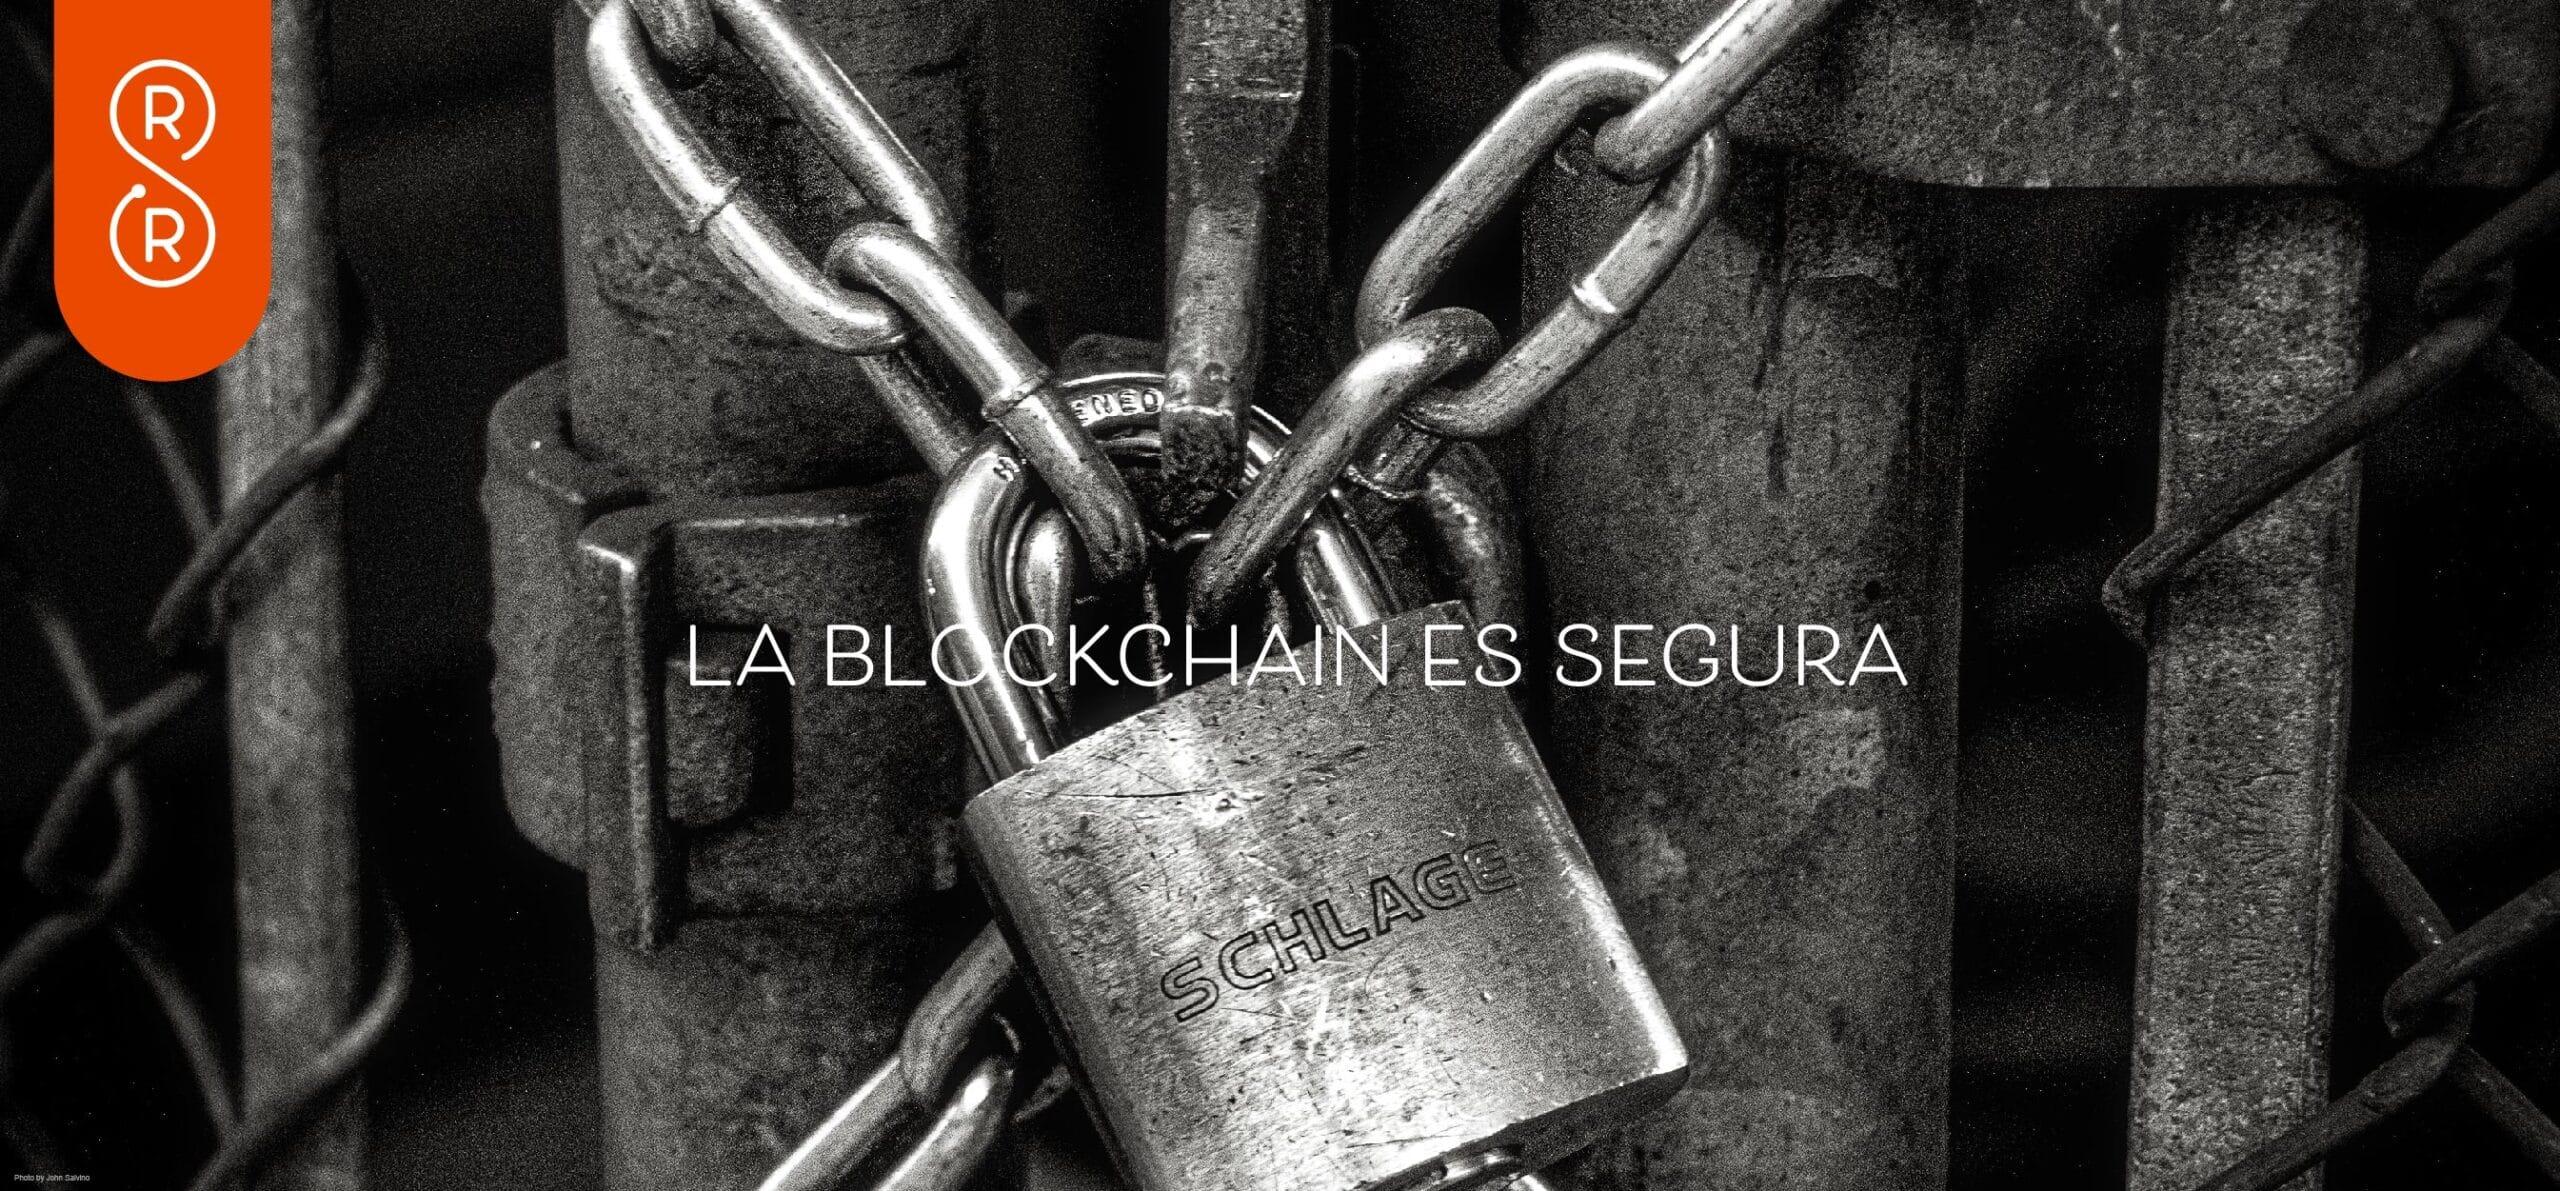 blockchain segura scaled